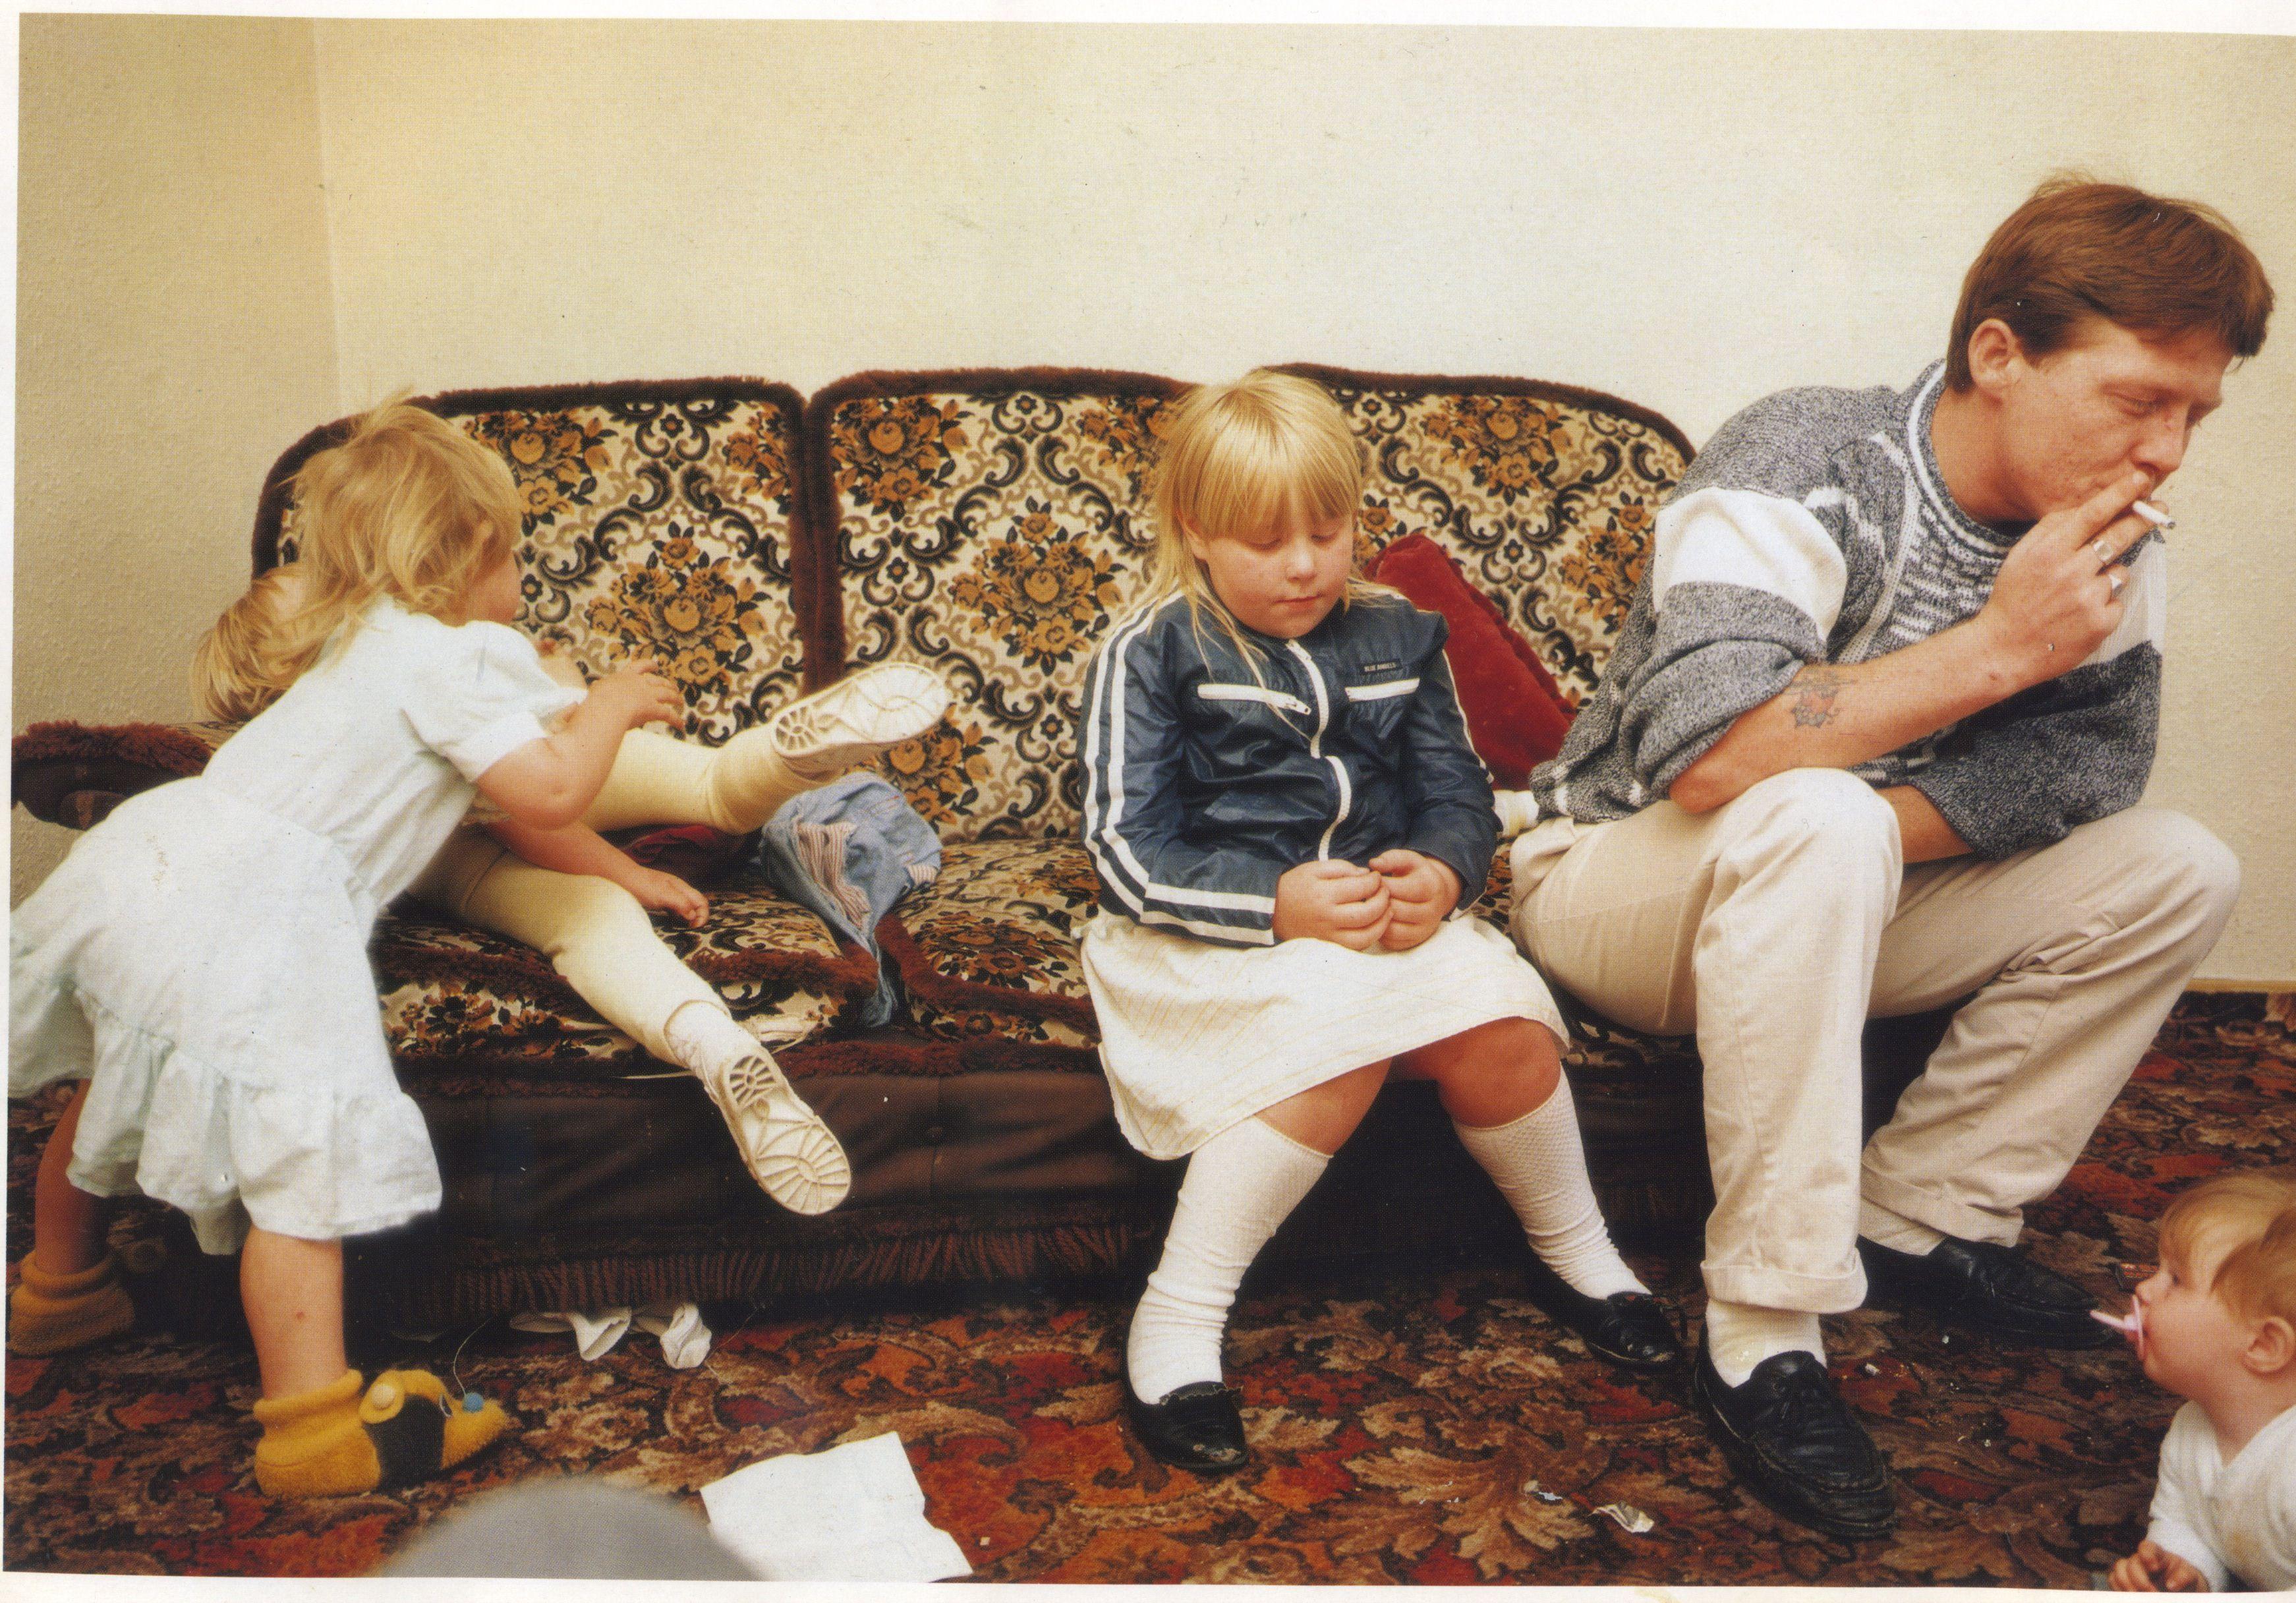 Nick waplington living room